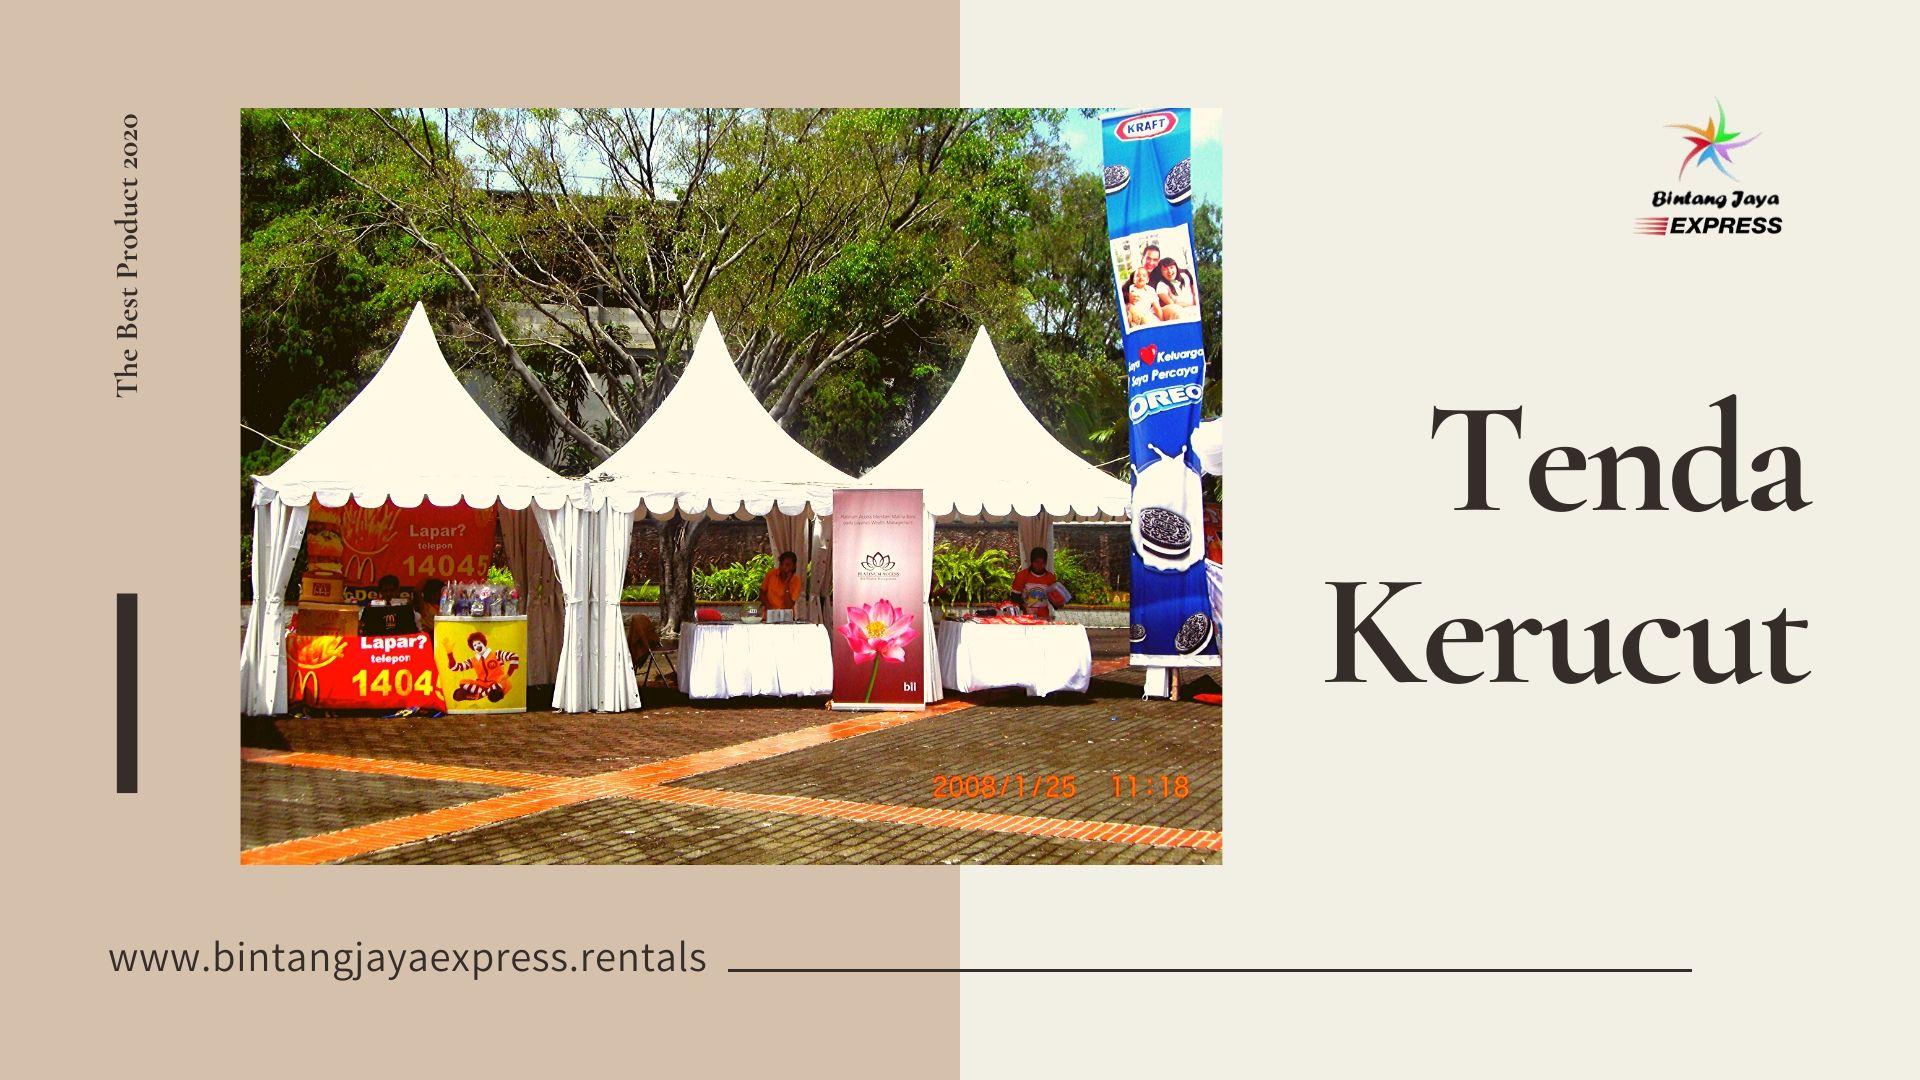 Sewa Alat Pesta Bintang Jaya Express Pesan Tanpa Minimum Order